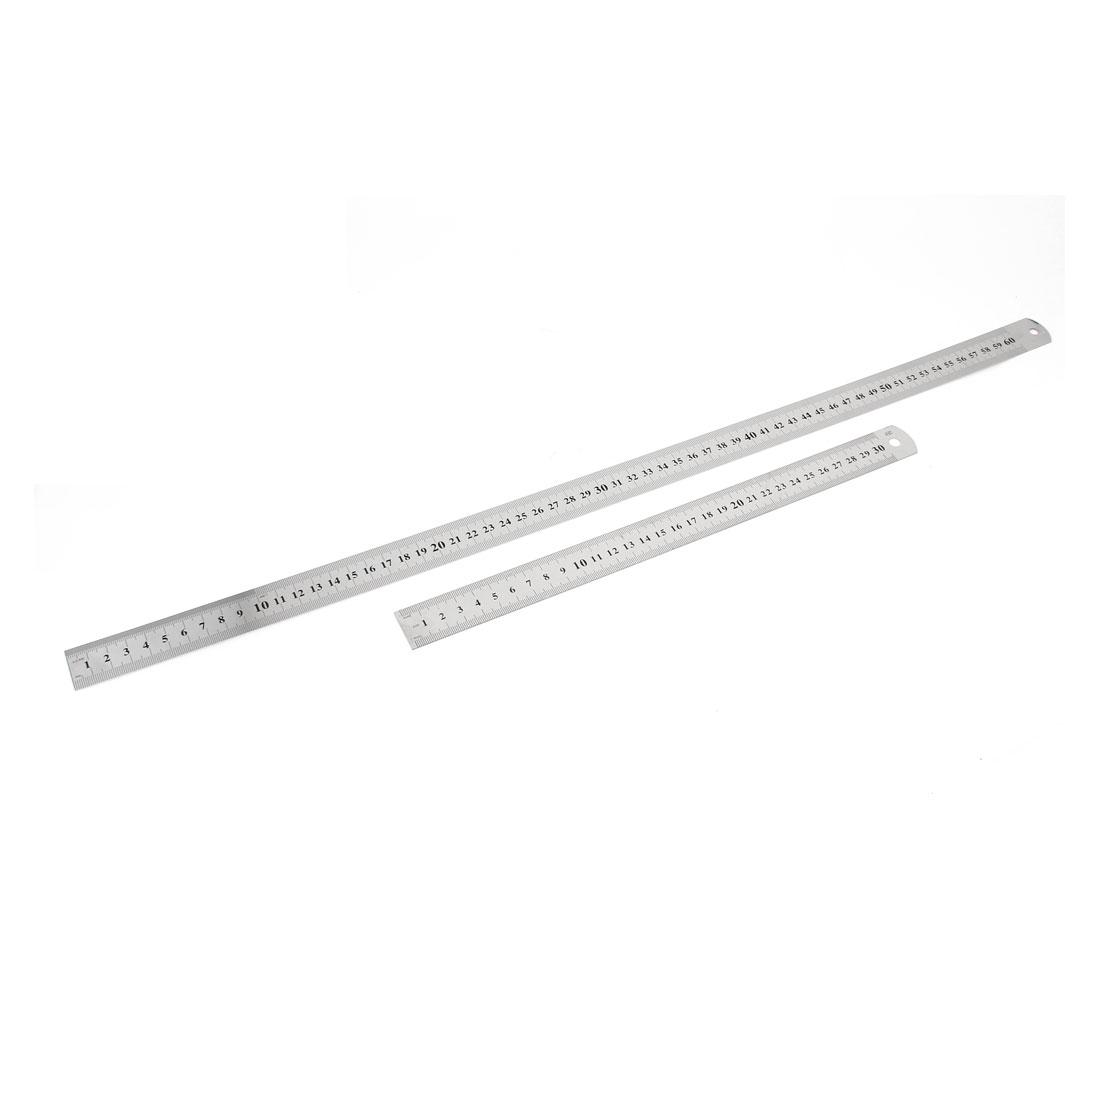 2 in 1 30cm 60cm Measuring Dual Sides School Metric Straight Ruler Silver Tone